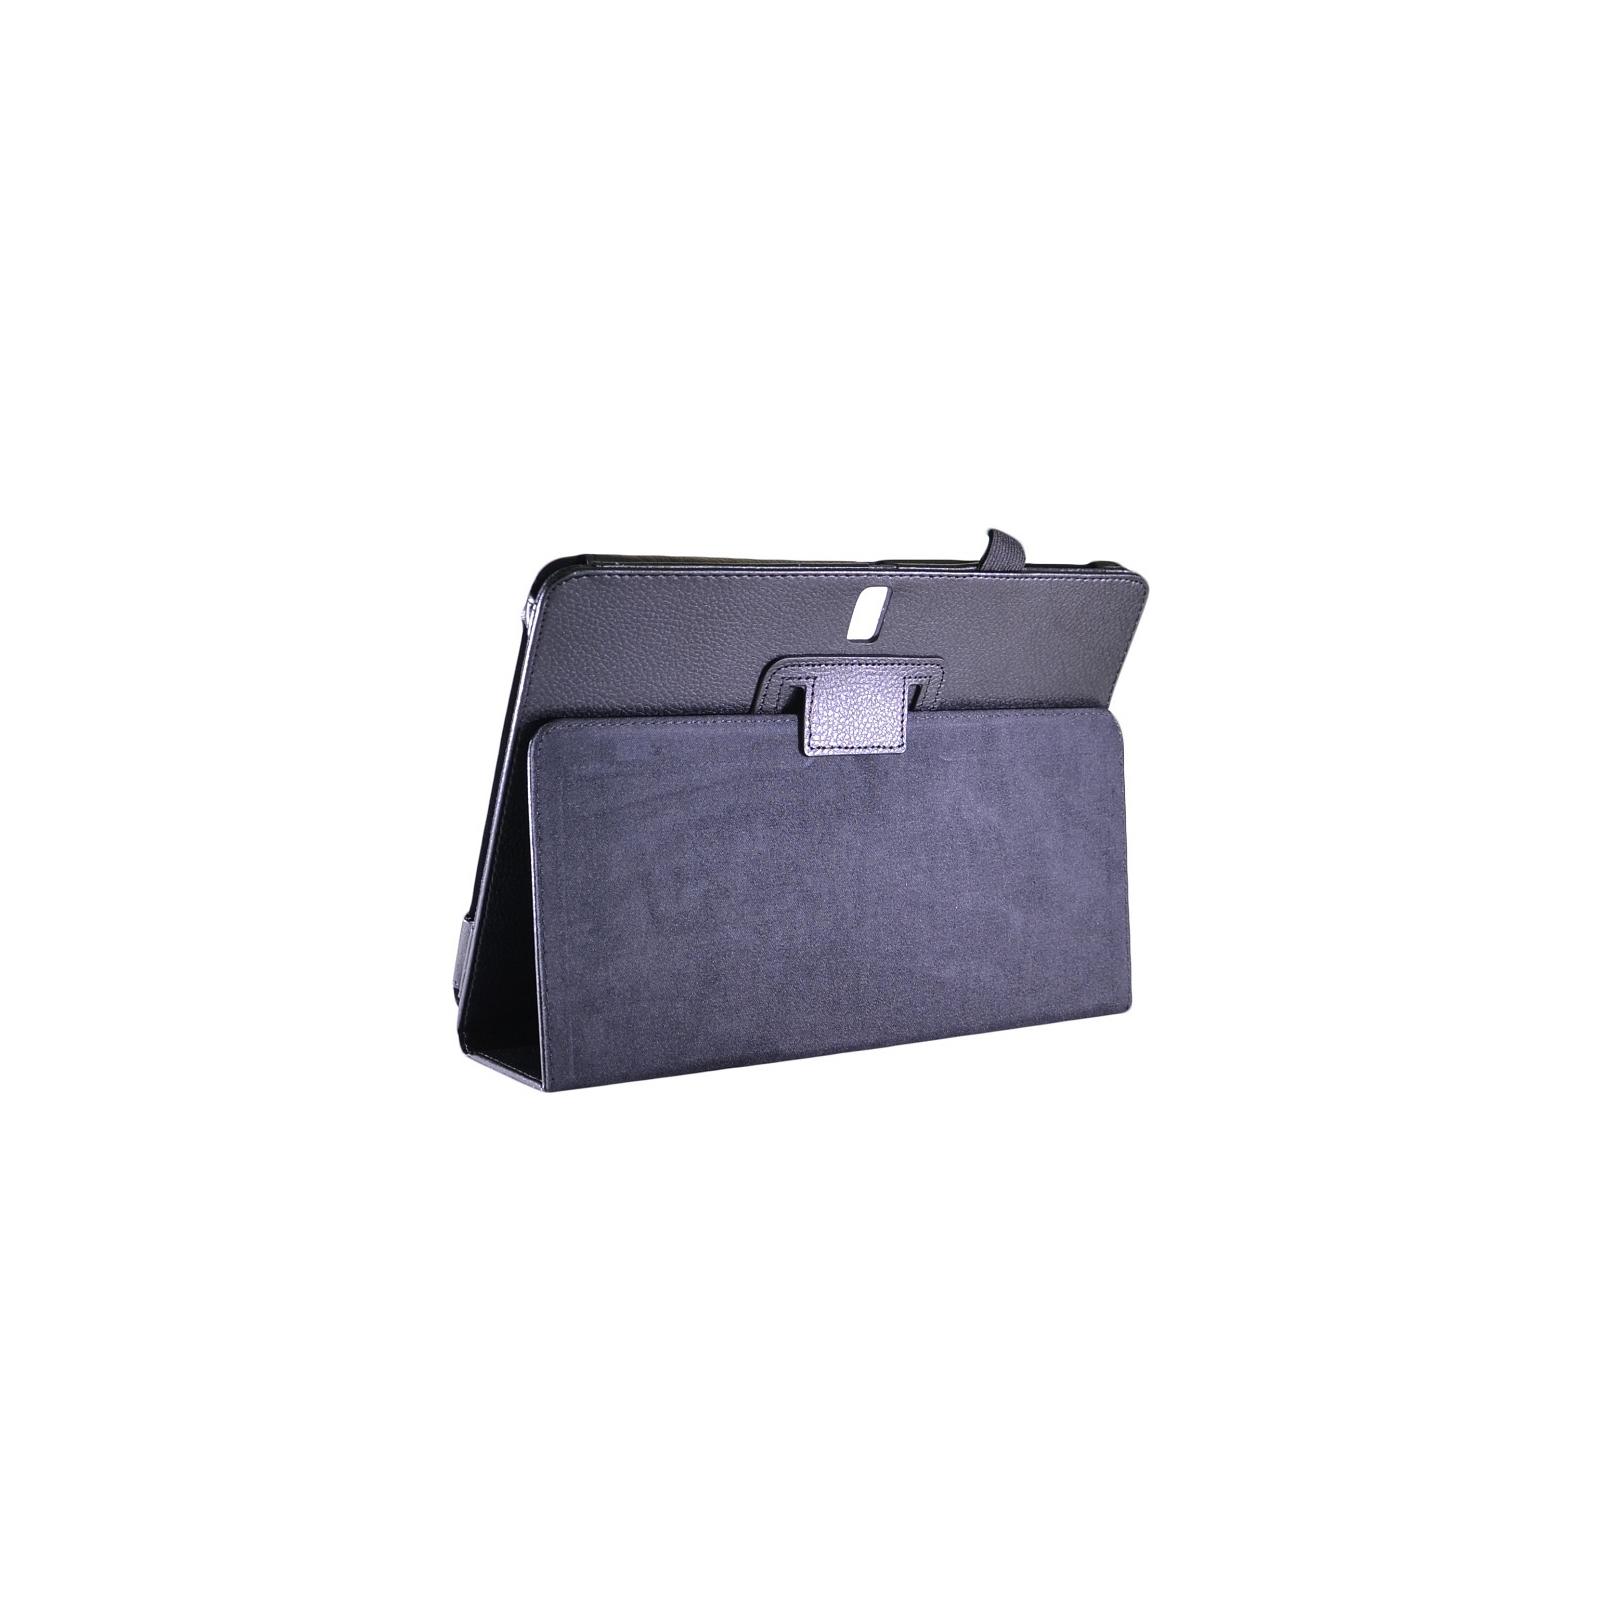 "Чехол для планшета Pro-case 10,5"" SM-T800 Galaxy Tab S 10.5 black (SM-T800b) изображение 4"